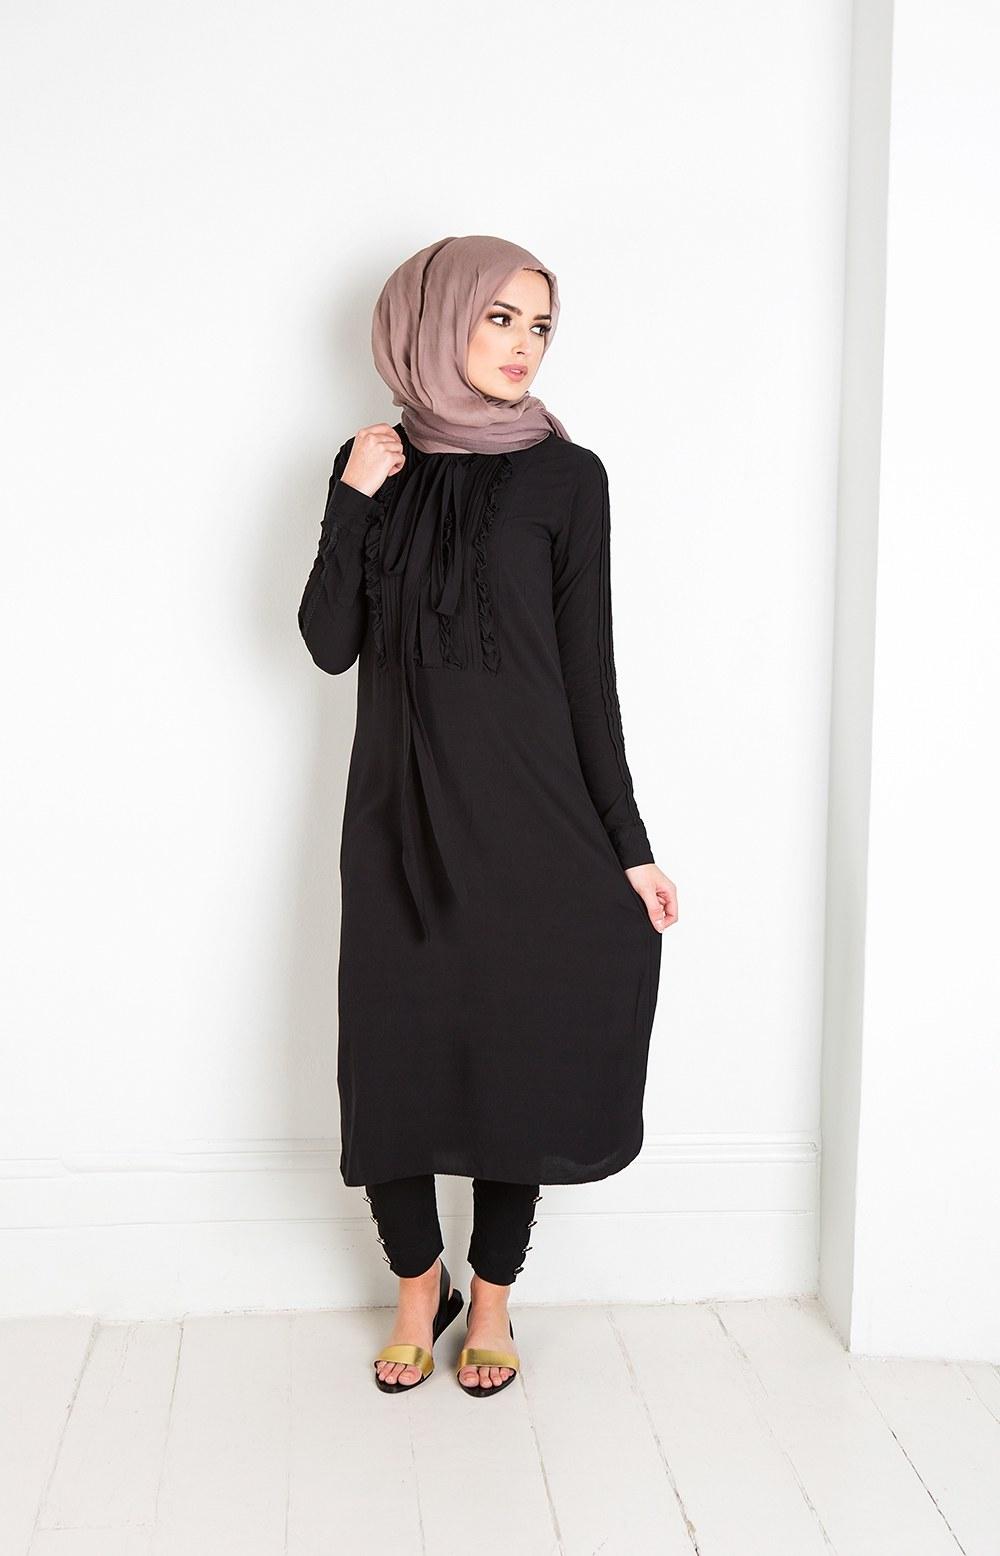 Ide Trend Baju Lebaran 2017 8ydm 25 Trend Model Baju Muslim Lebaran 2018 Simple & Modis